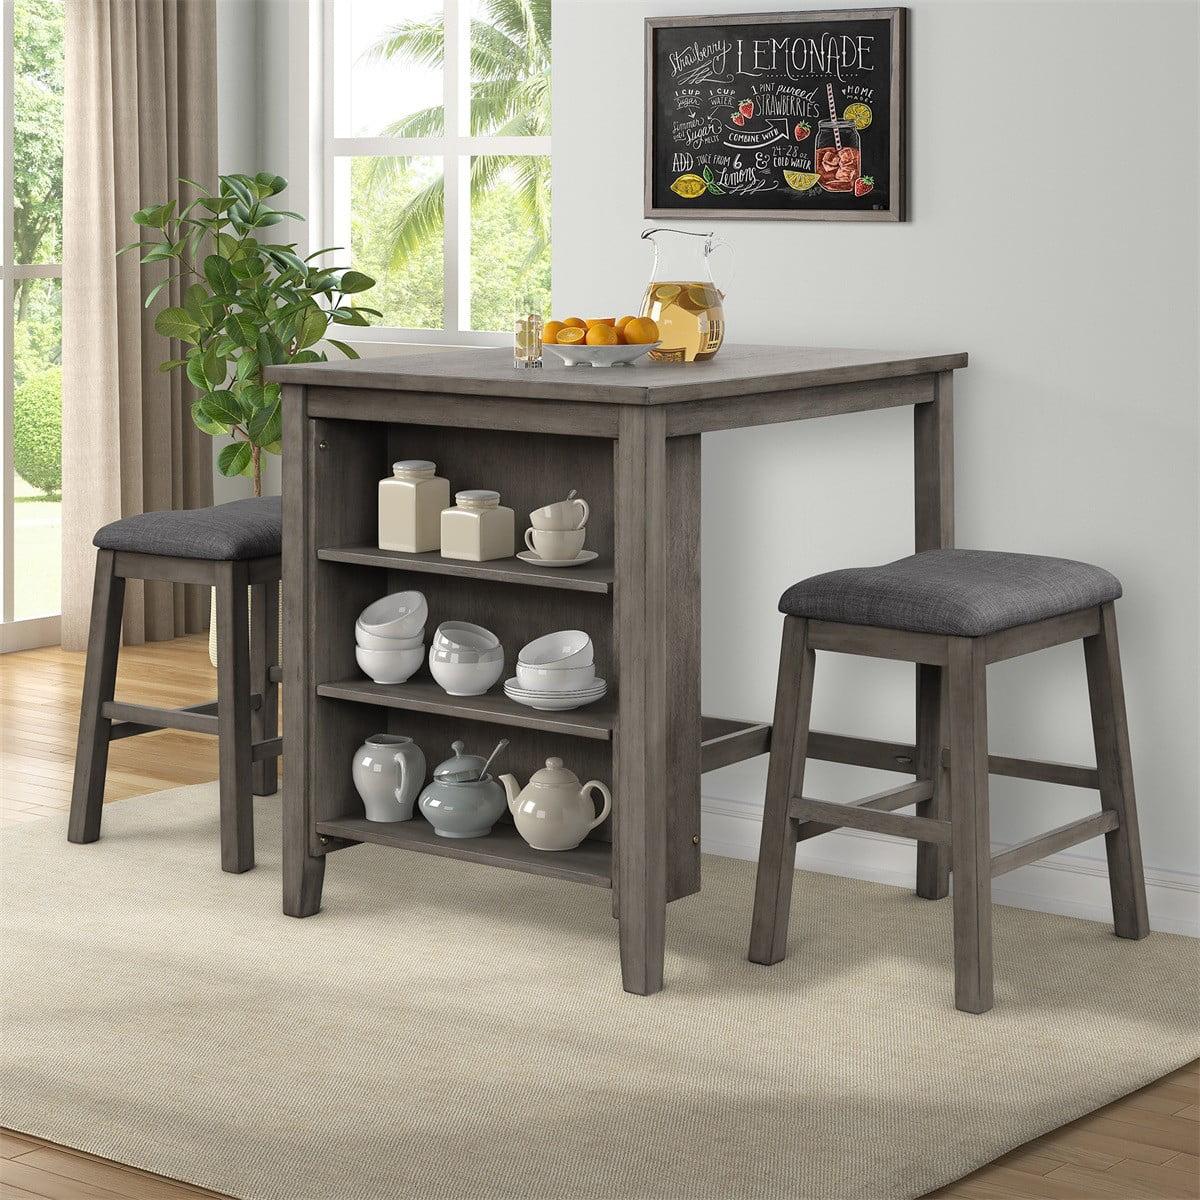 ModernLuxe 3-Piece Wooden Counter Height Dining Table Set ...